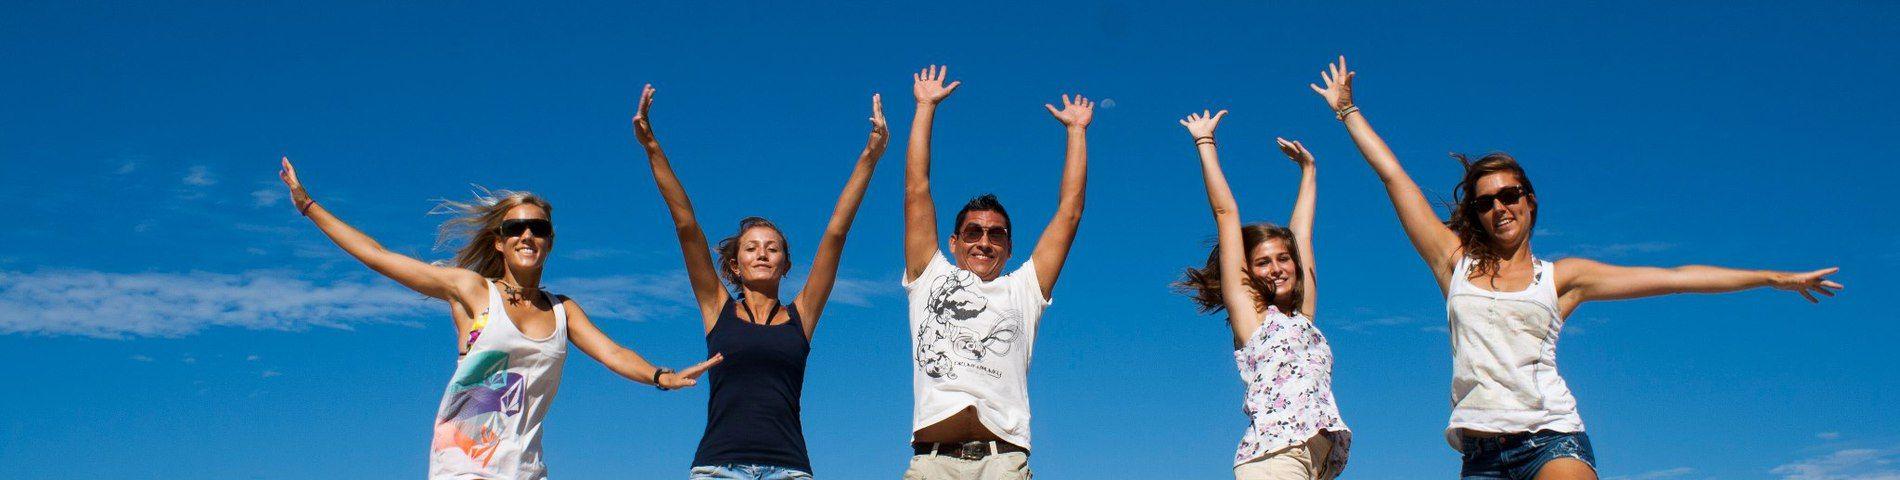 Experiencia Spanish & Surf School bild 1